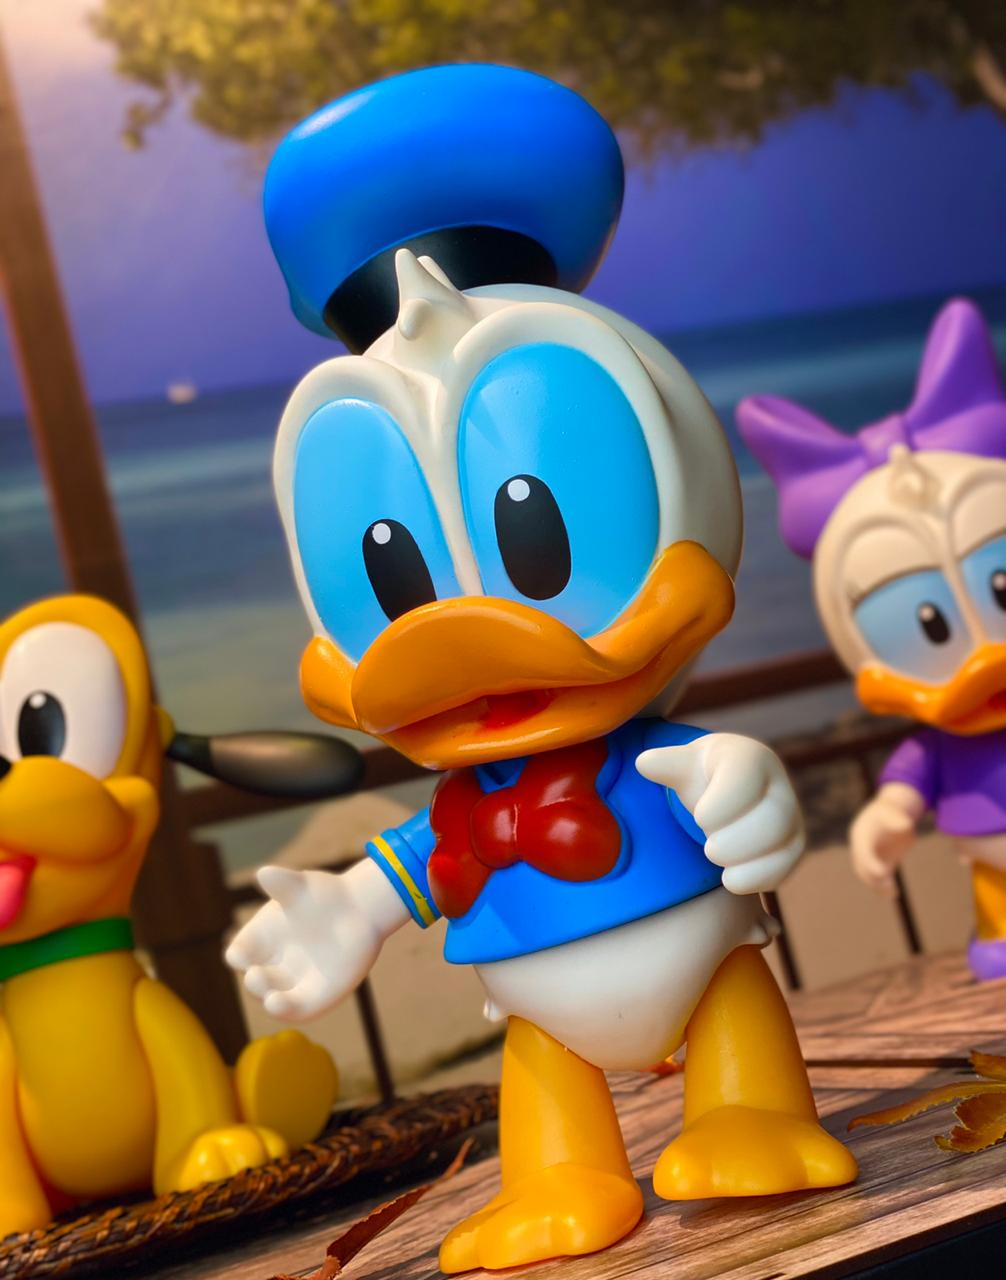 Boneco Vinil: Pato Donald Baby (Disney) - Lider